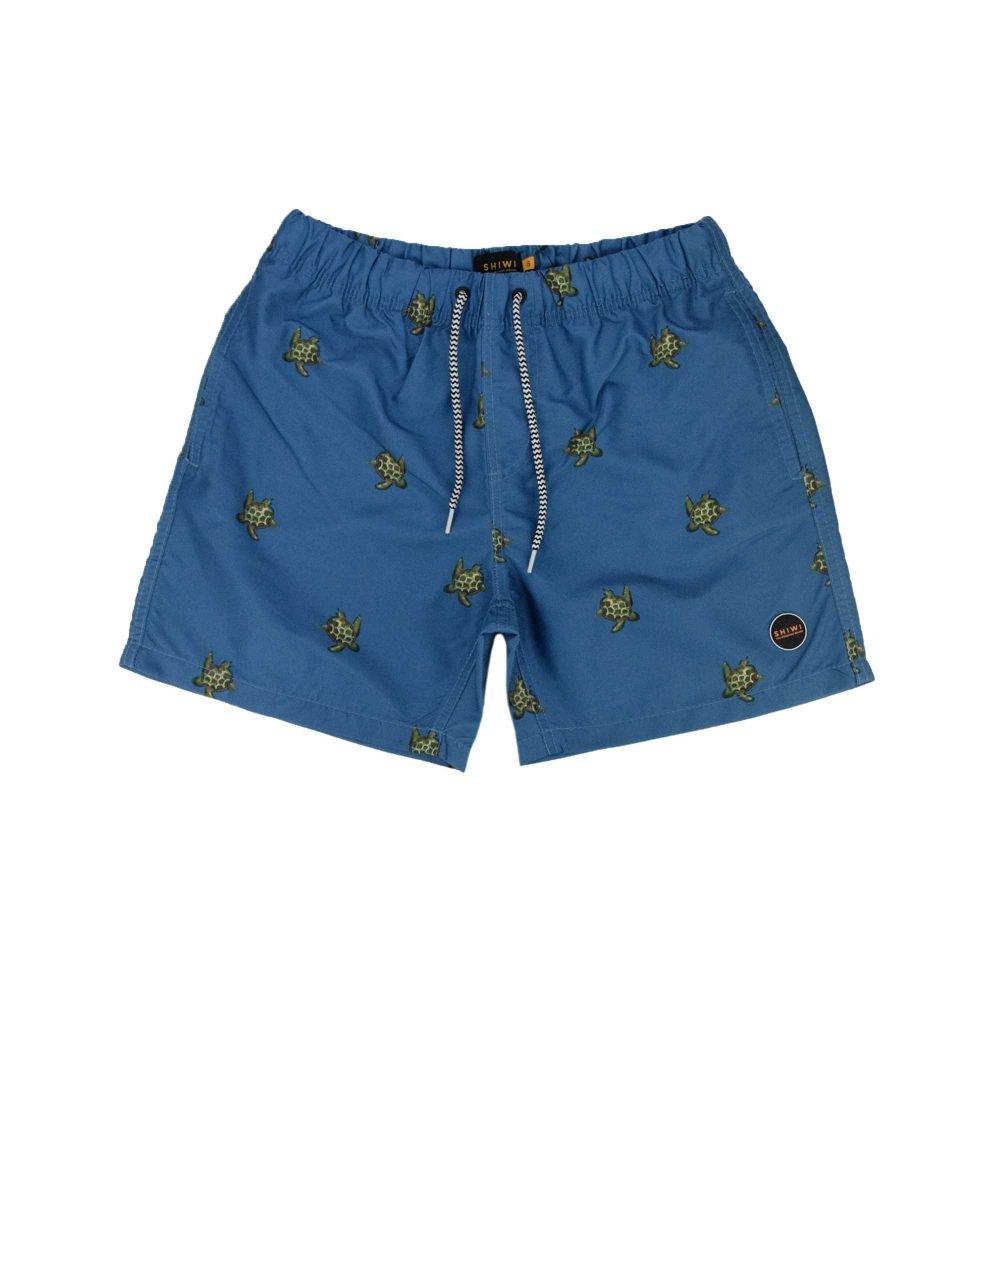 Shiwi Swimwear (4192111147-664) Yacht Blue